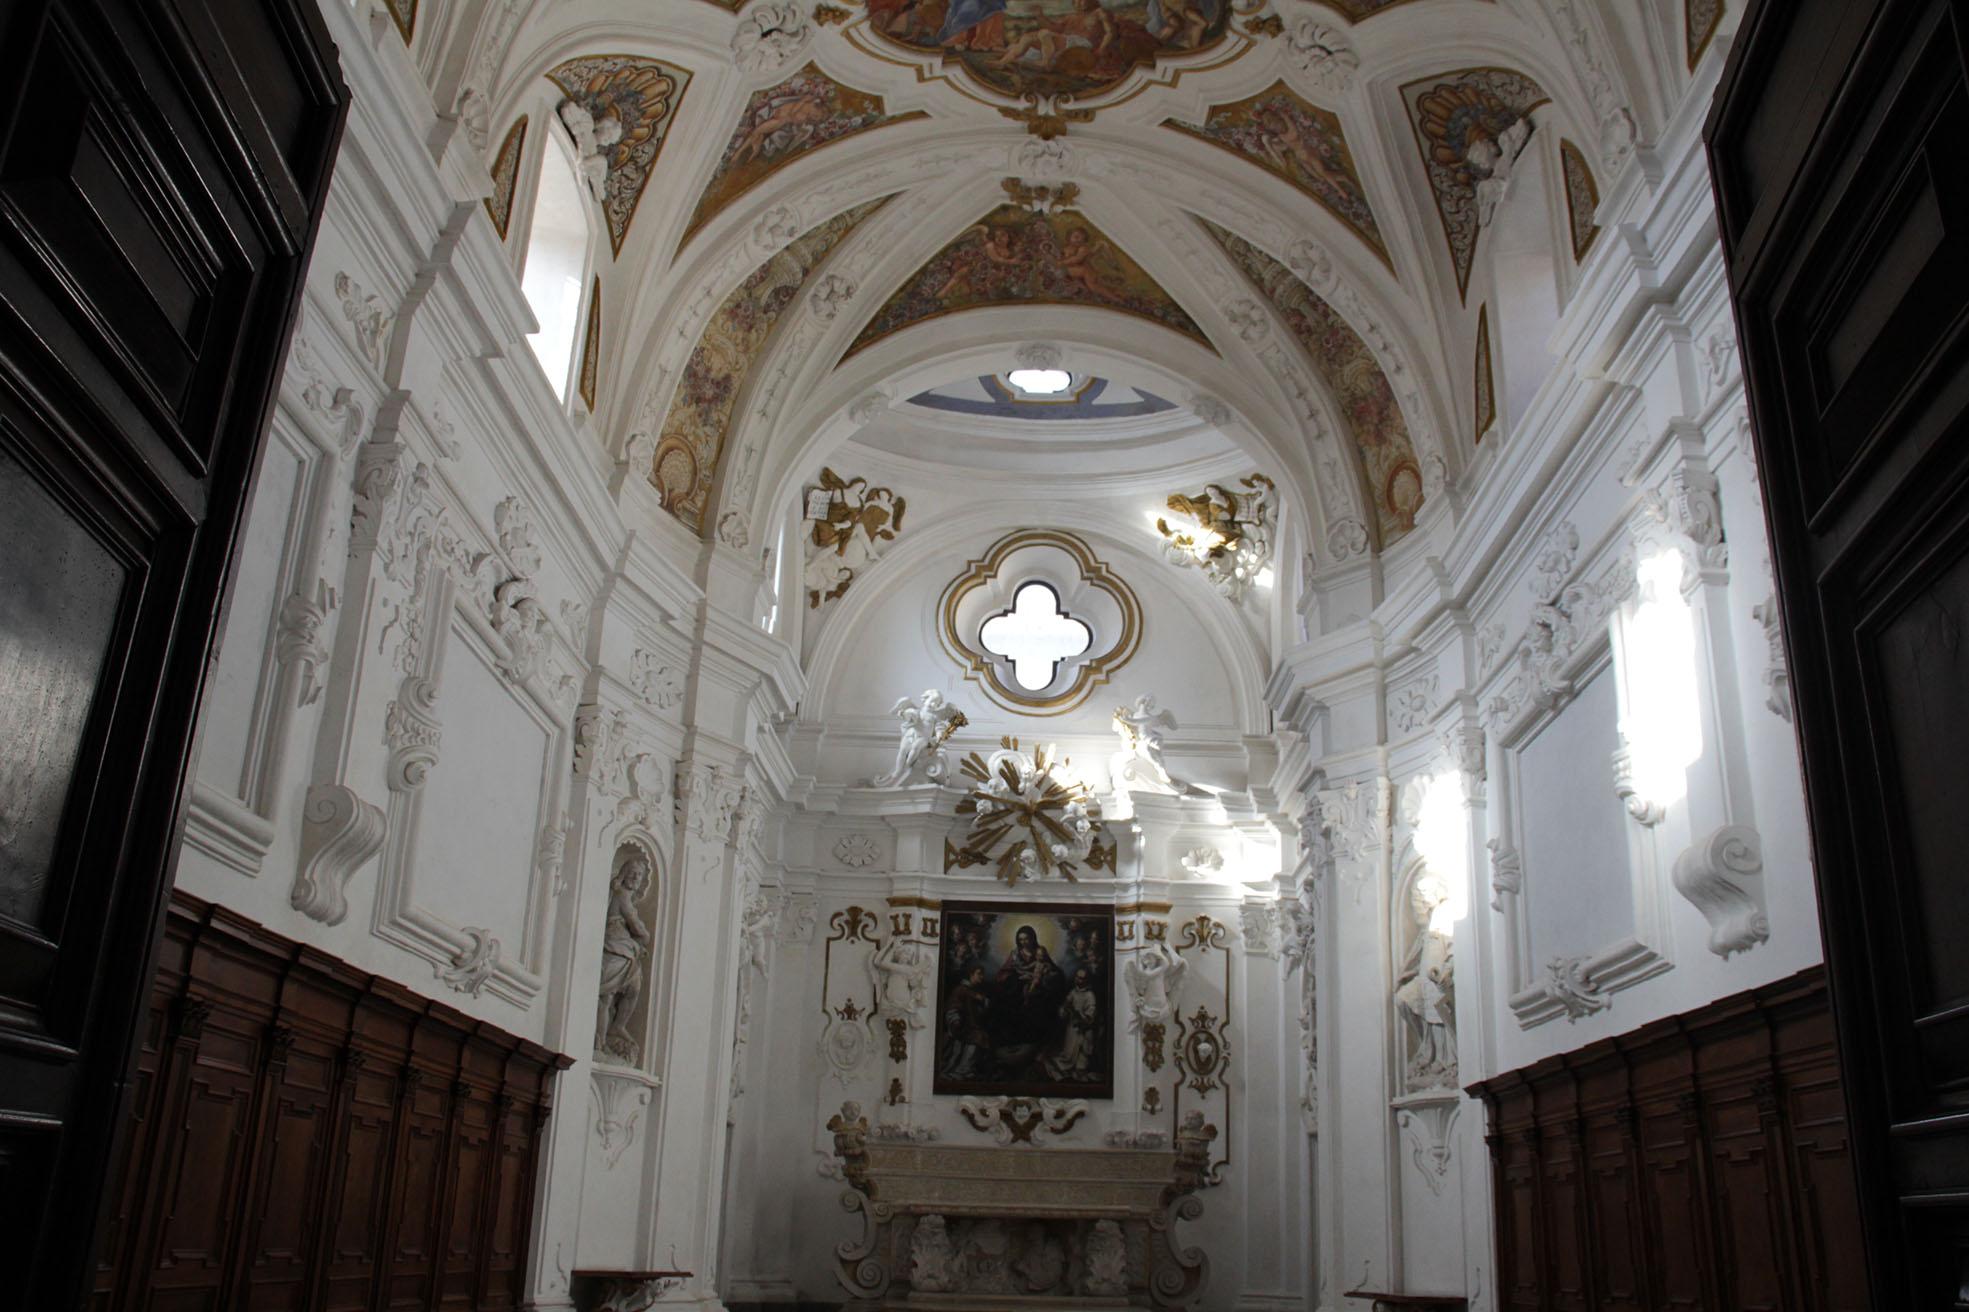 Arriva a Padula la Schola Cantorum del Pontificio istituto